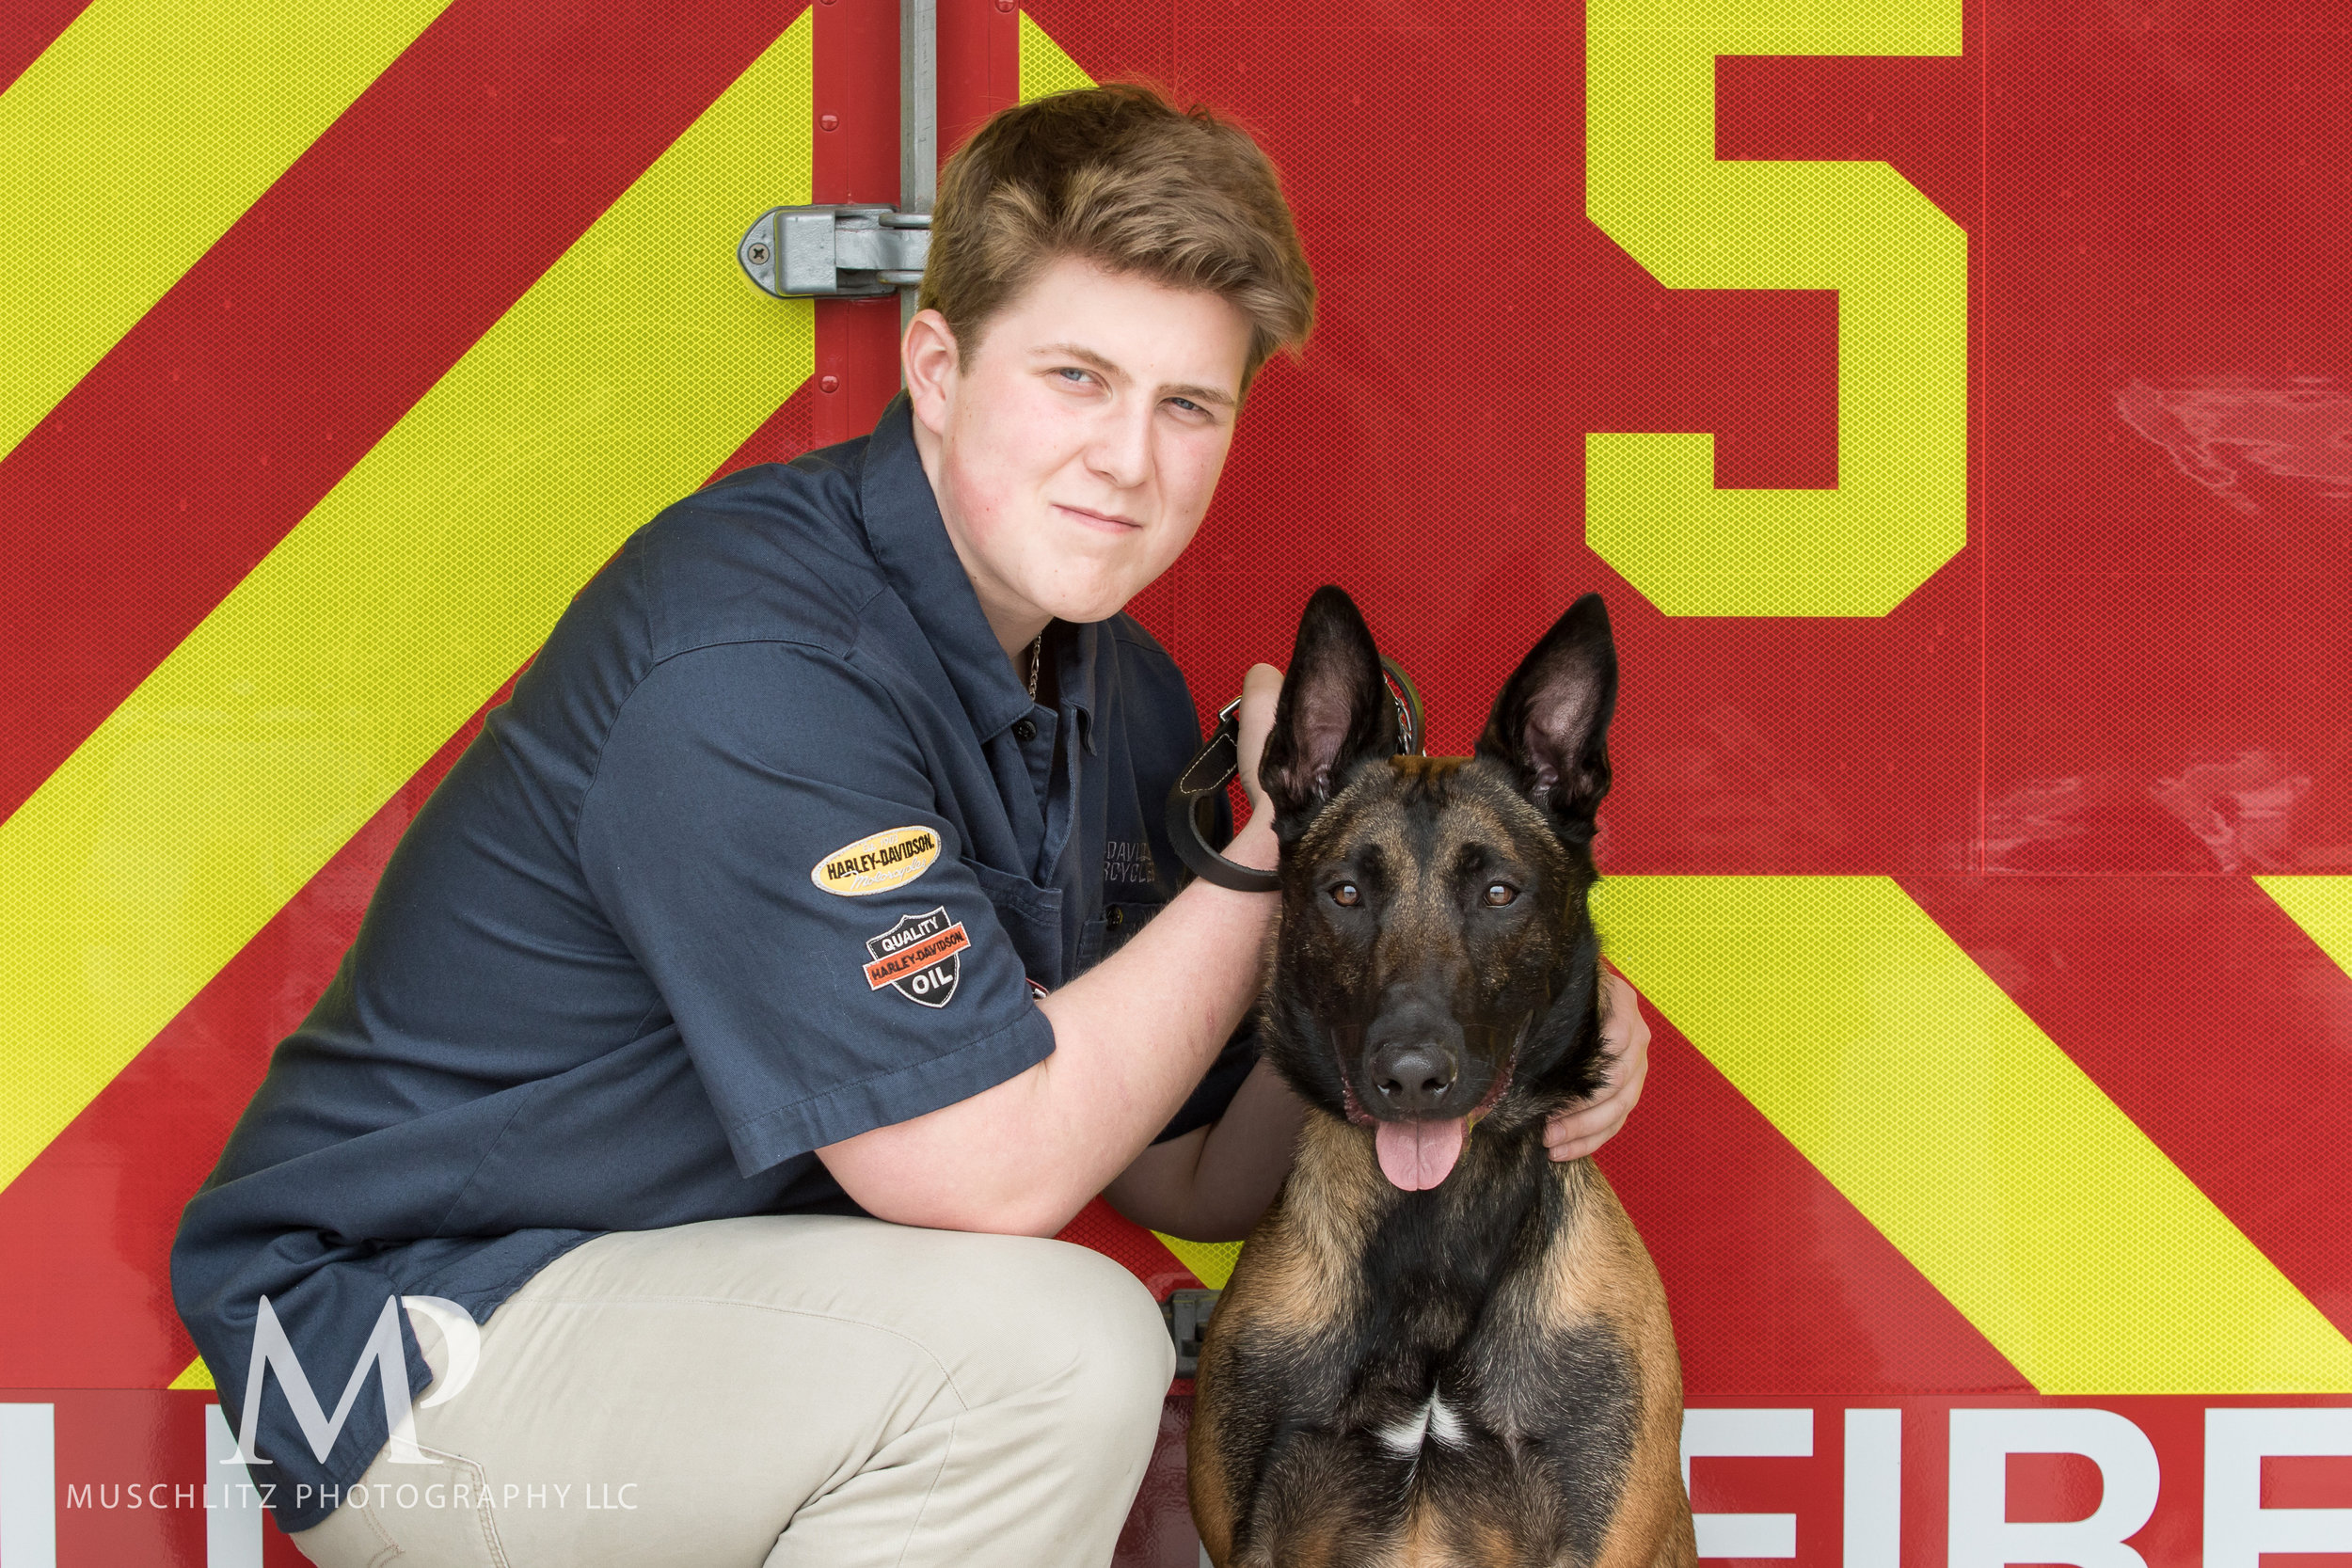 senior-portrait-fire-station-fireman-gahanna-columbus-photographer-studio-007.JPG